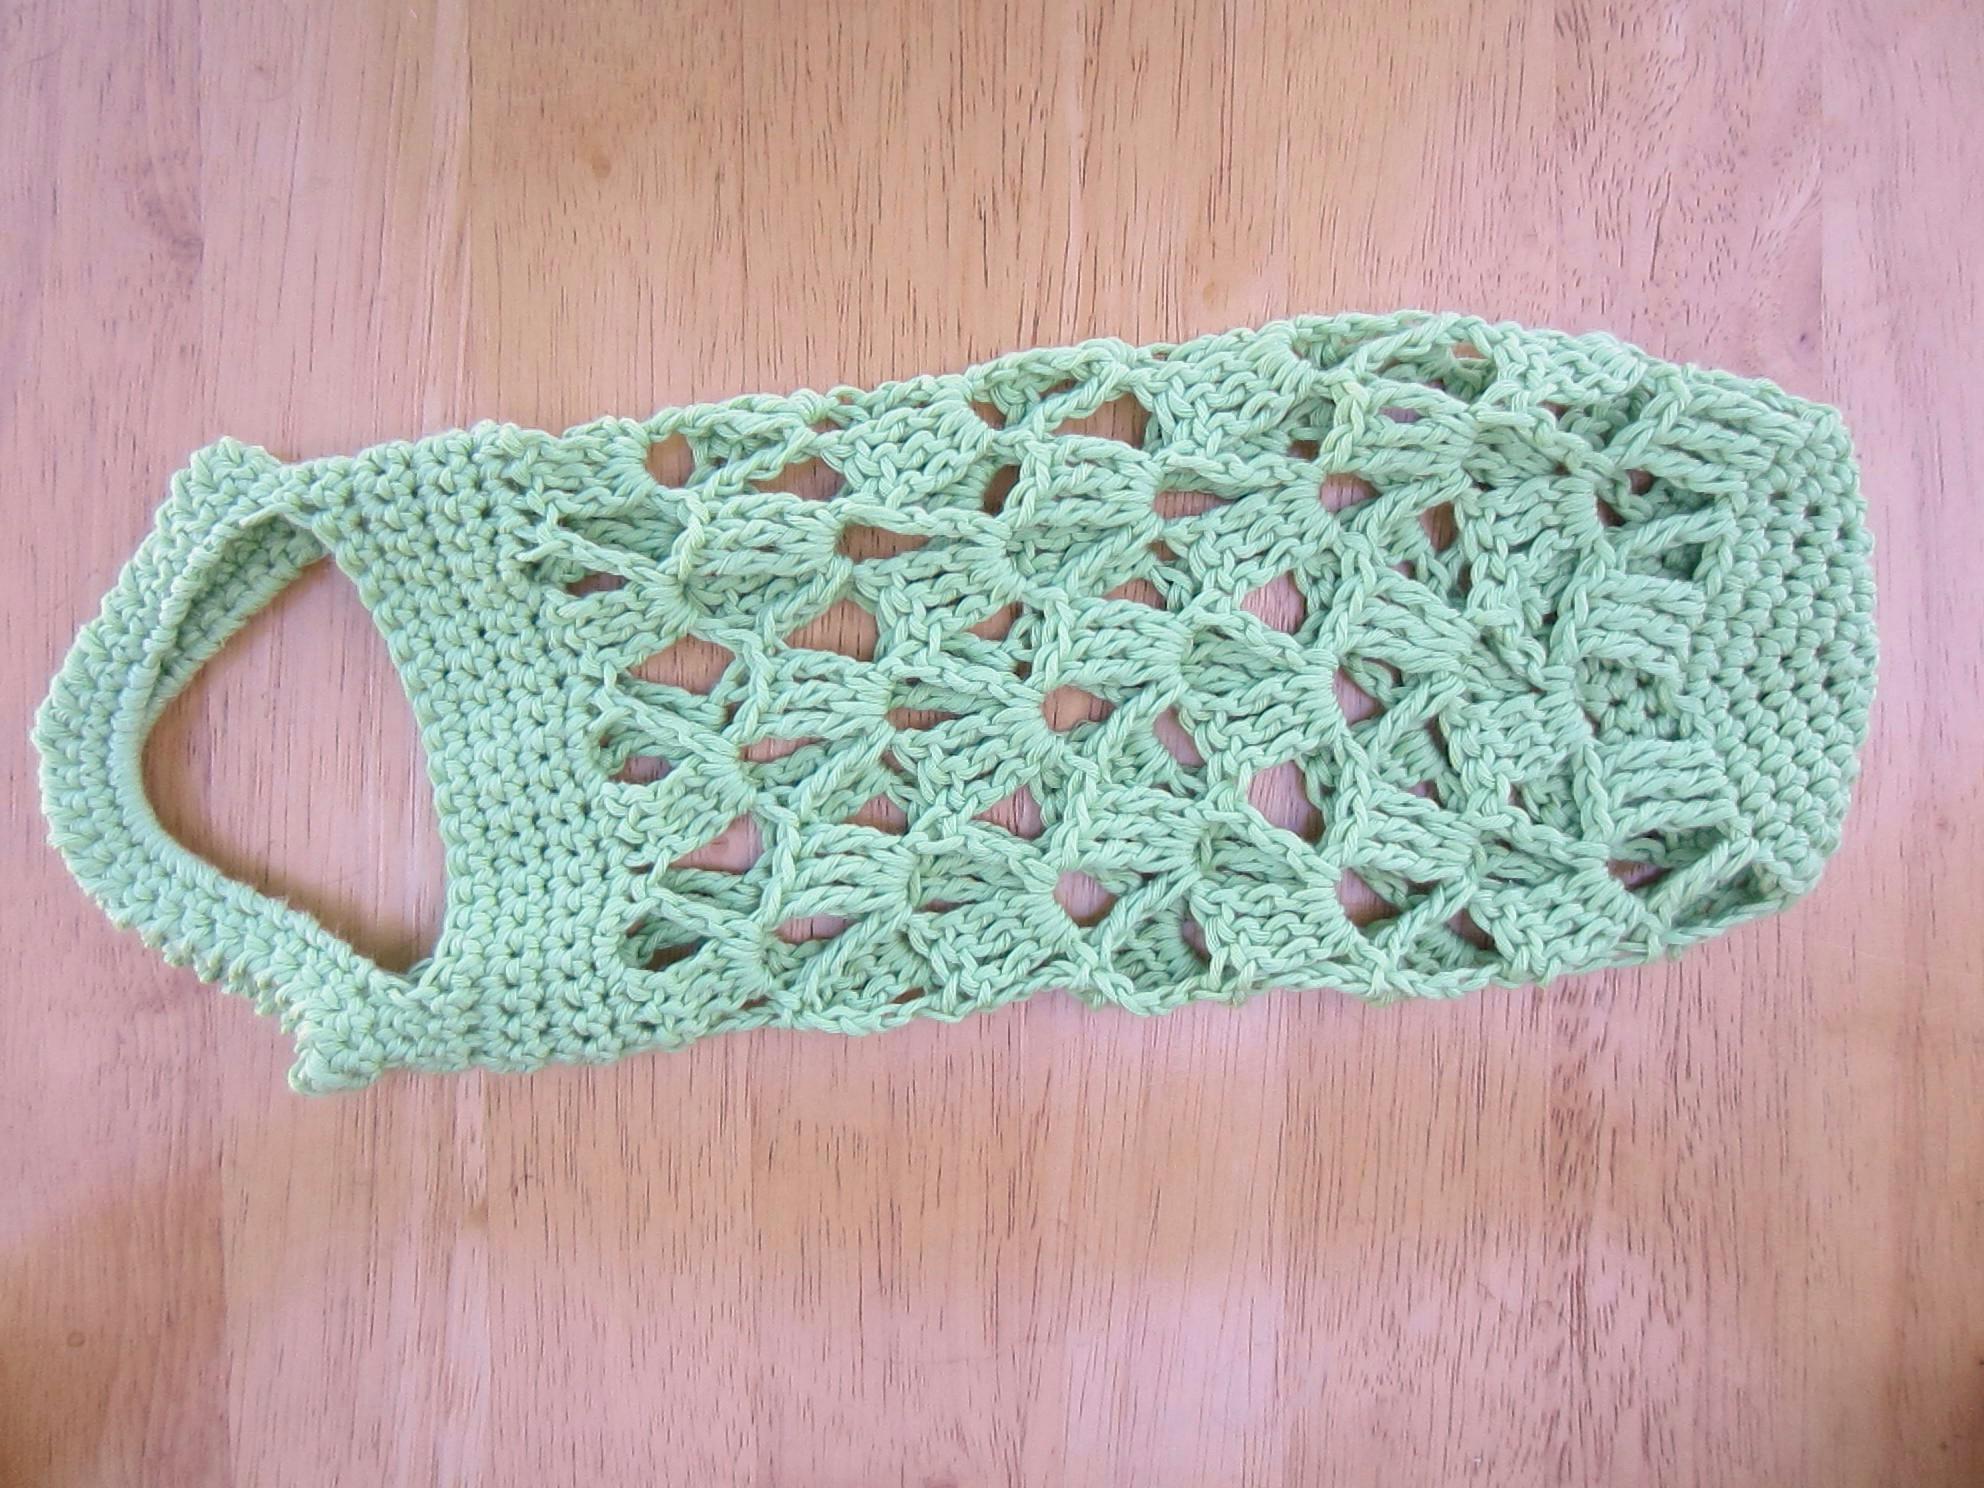 Crochet Wine Tote Prototype, Green Organic Cotton Yarn | G-Ma ...